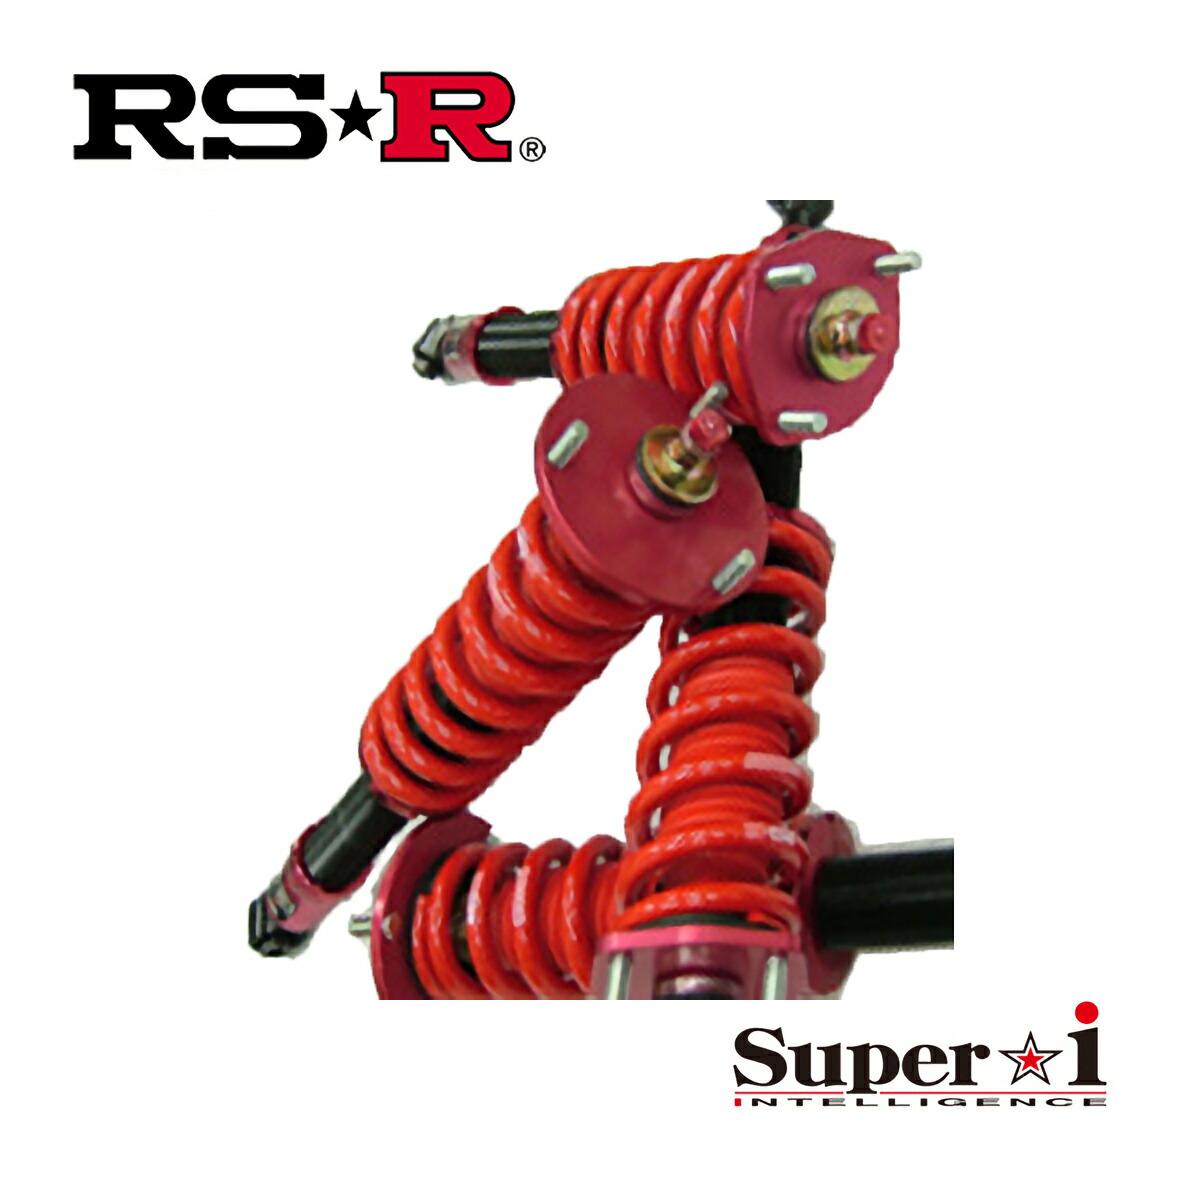 RS-R フーガハイブリッド ベースグレード HY51 車高調 リア車高調整:全長式/ハードバネレート仕様 LIN281H RSR スーパーi RSR 個人宅発送追金有